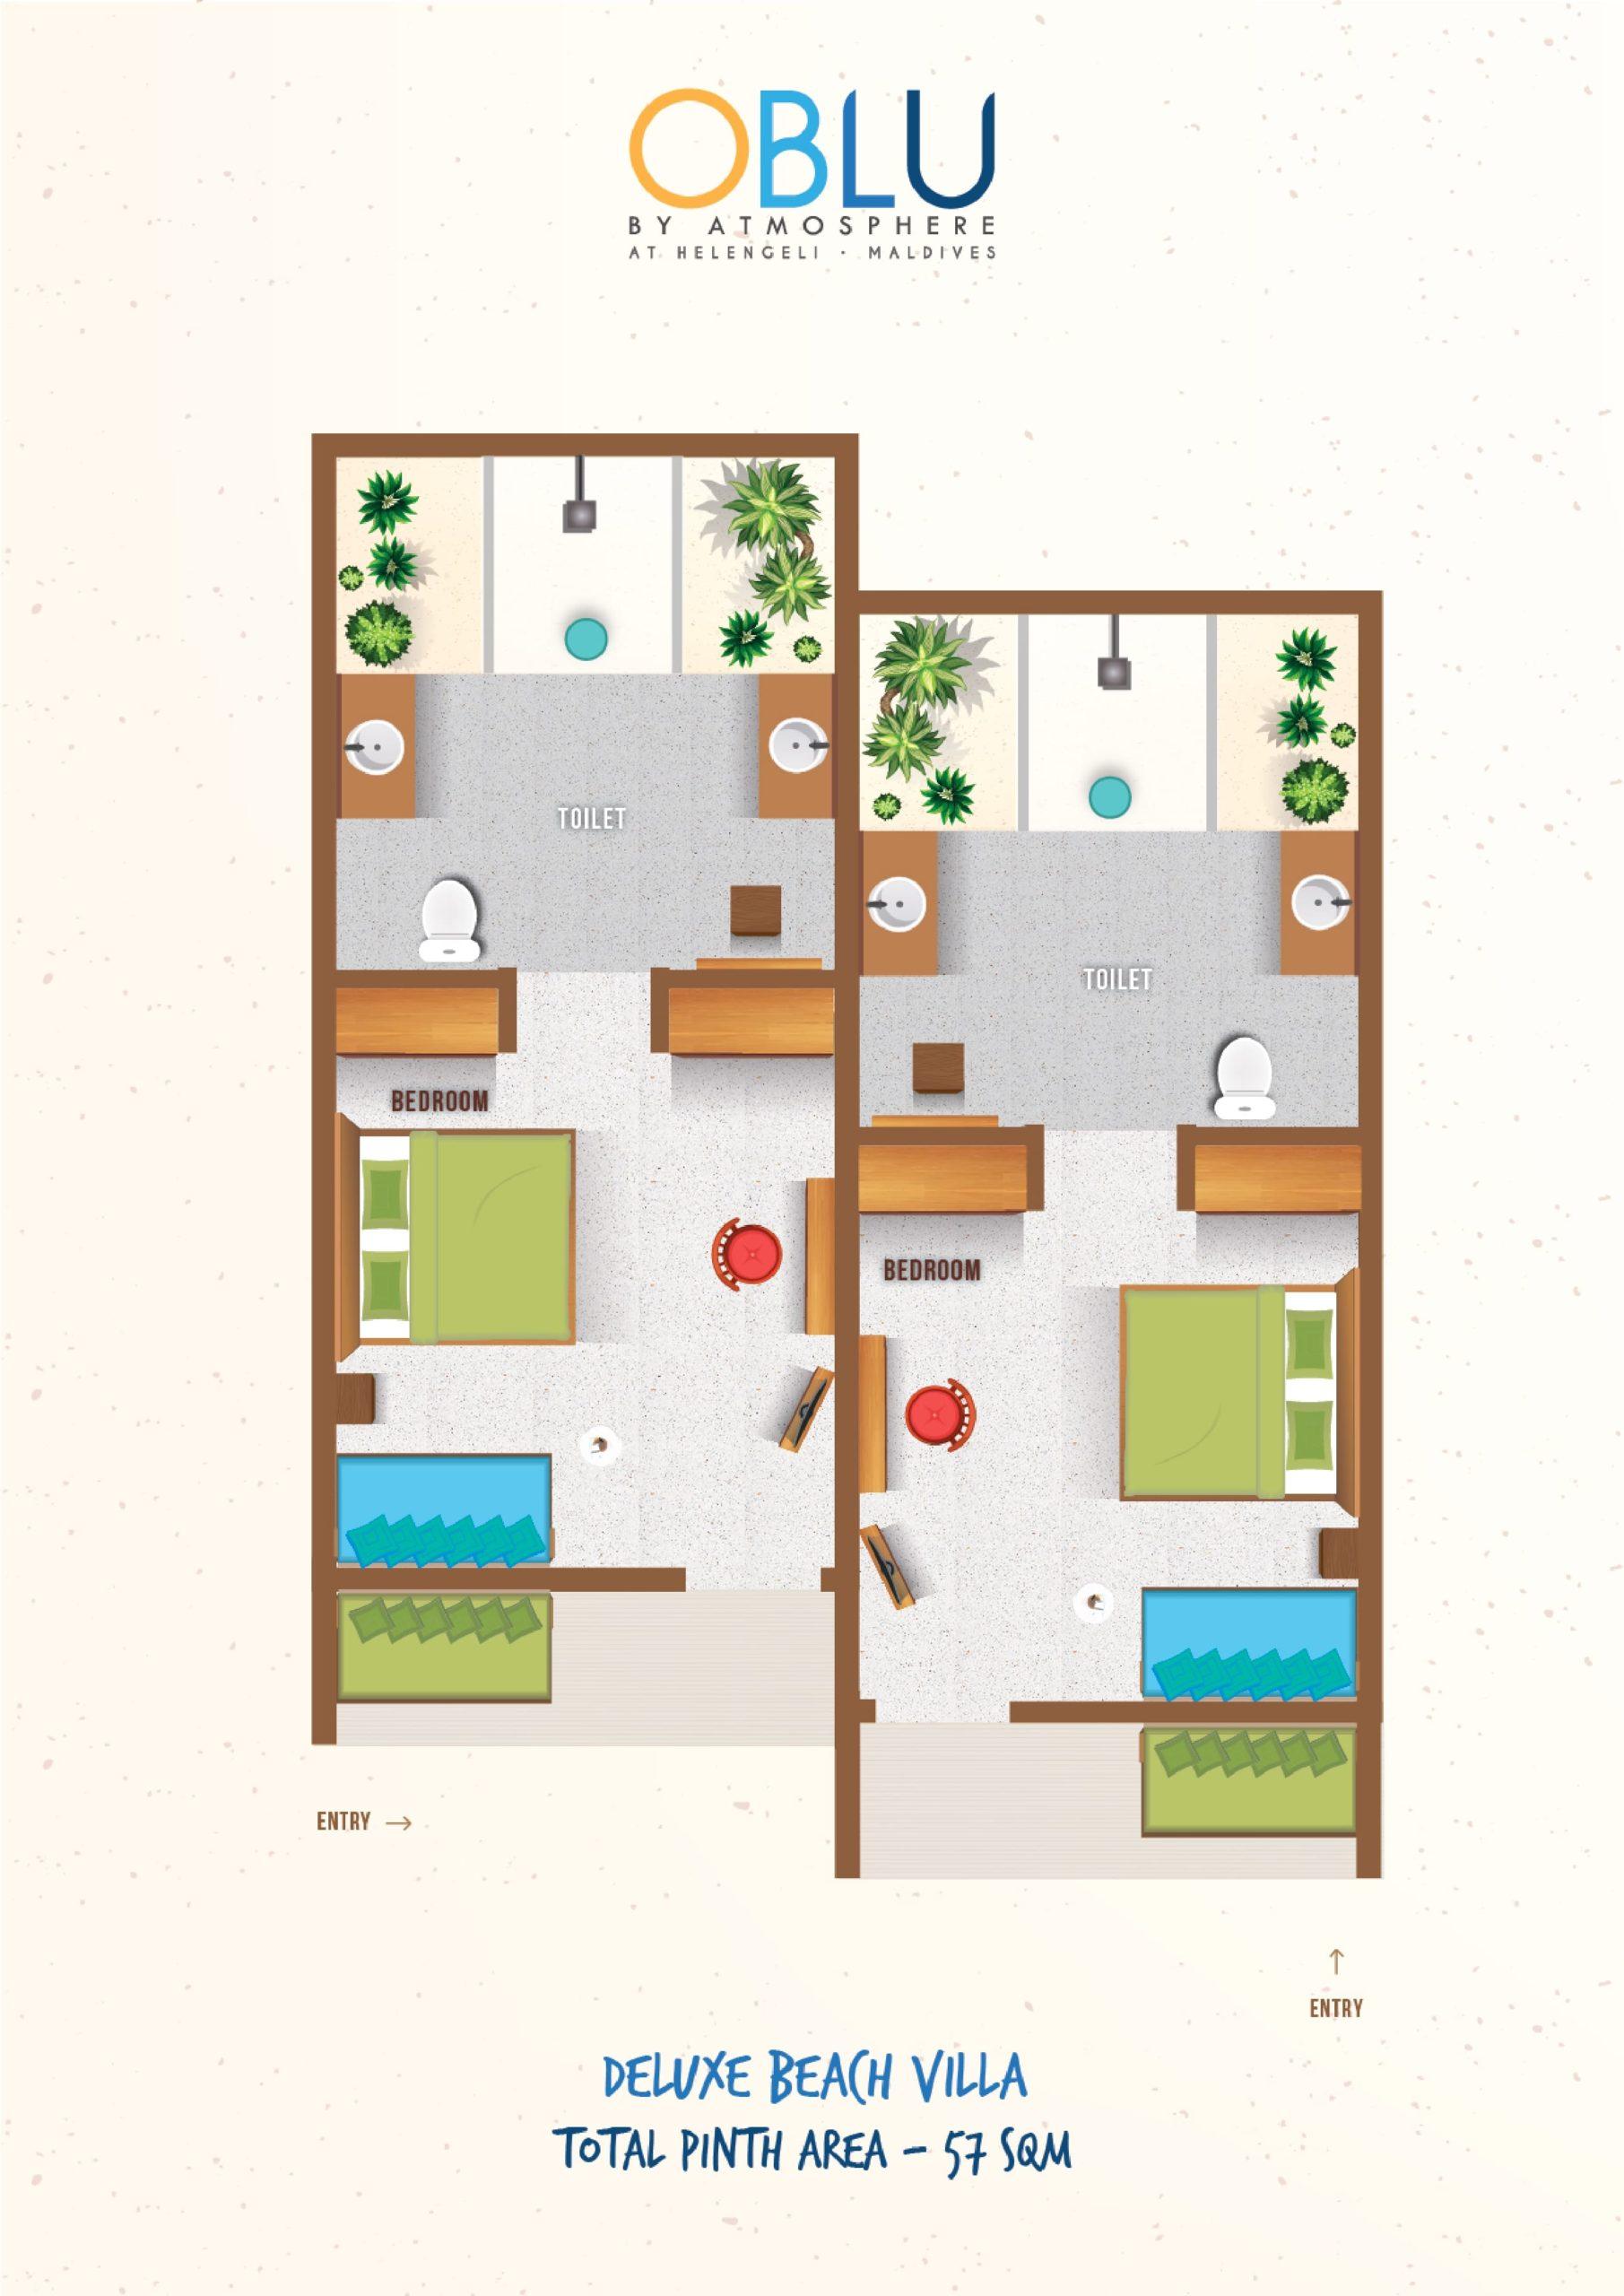 Мальдивы, отель OBLU by Atmosphere at Helengeli, план-схема номера Deluxe Beach Villa